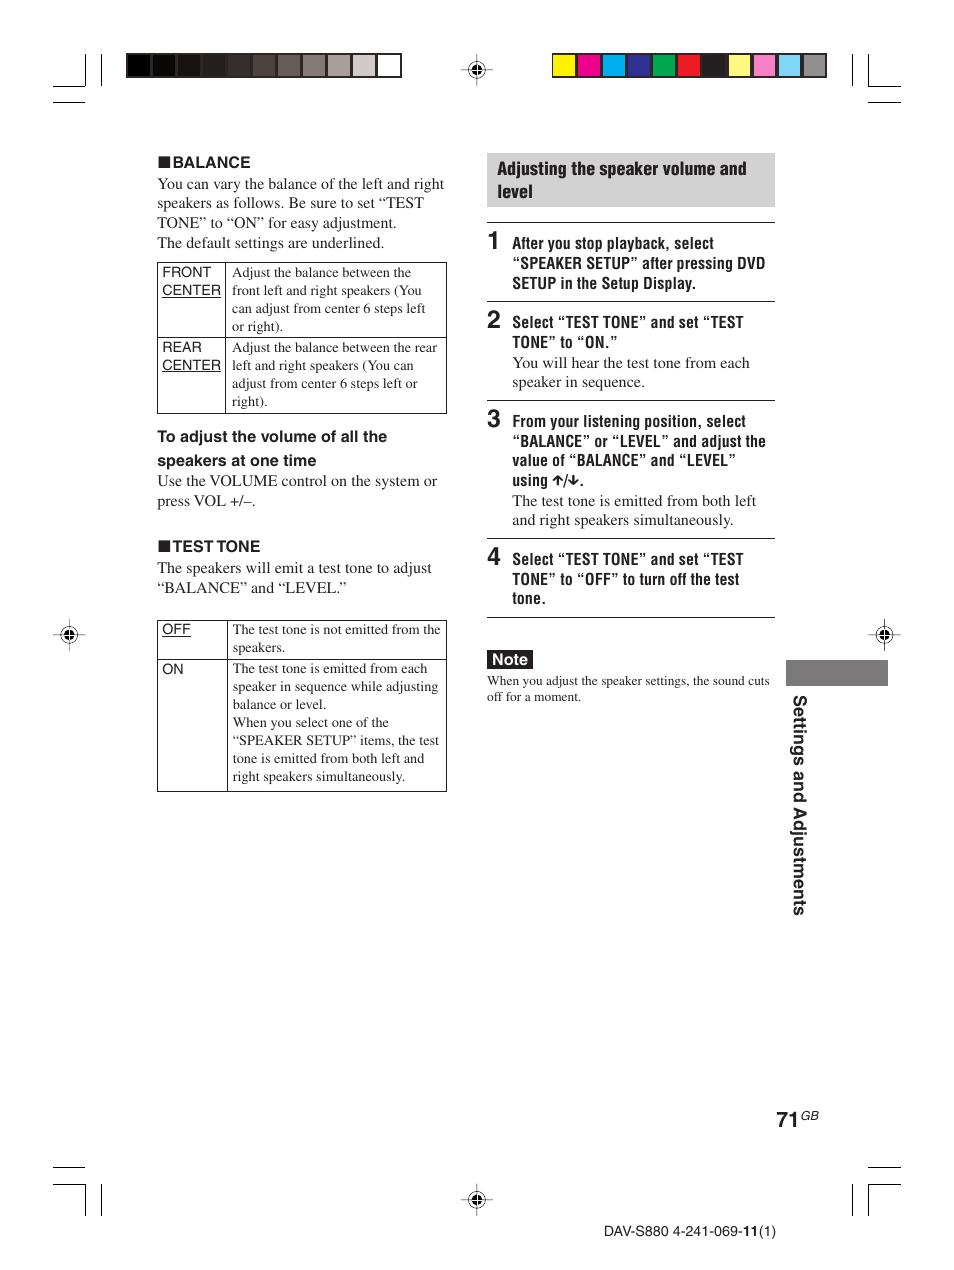 Sony DAV-S880 User Manual | Page 71 / 84